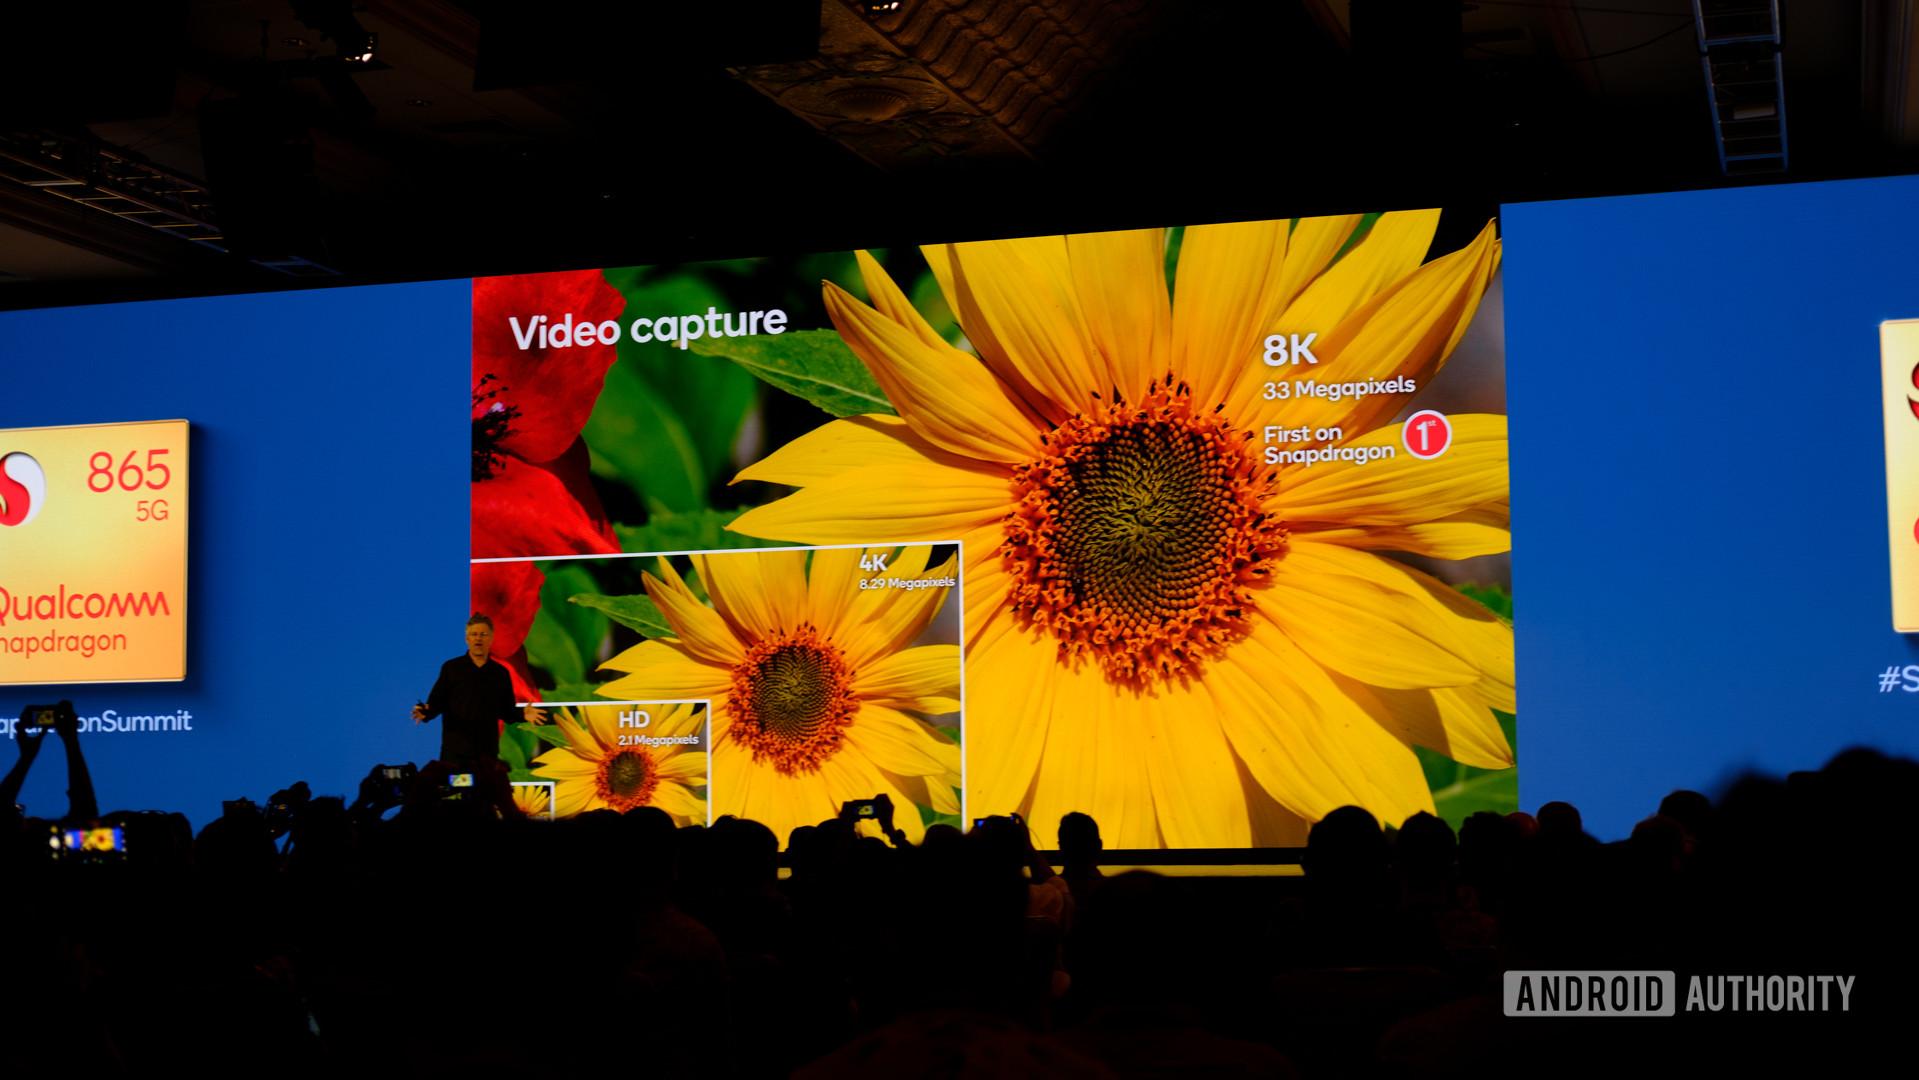 Qualcomm Snapdragon 865 8k 30p slides